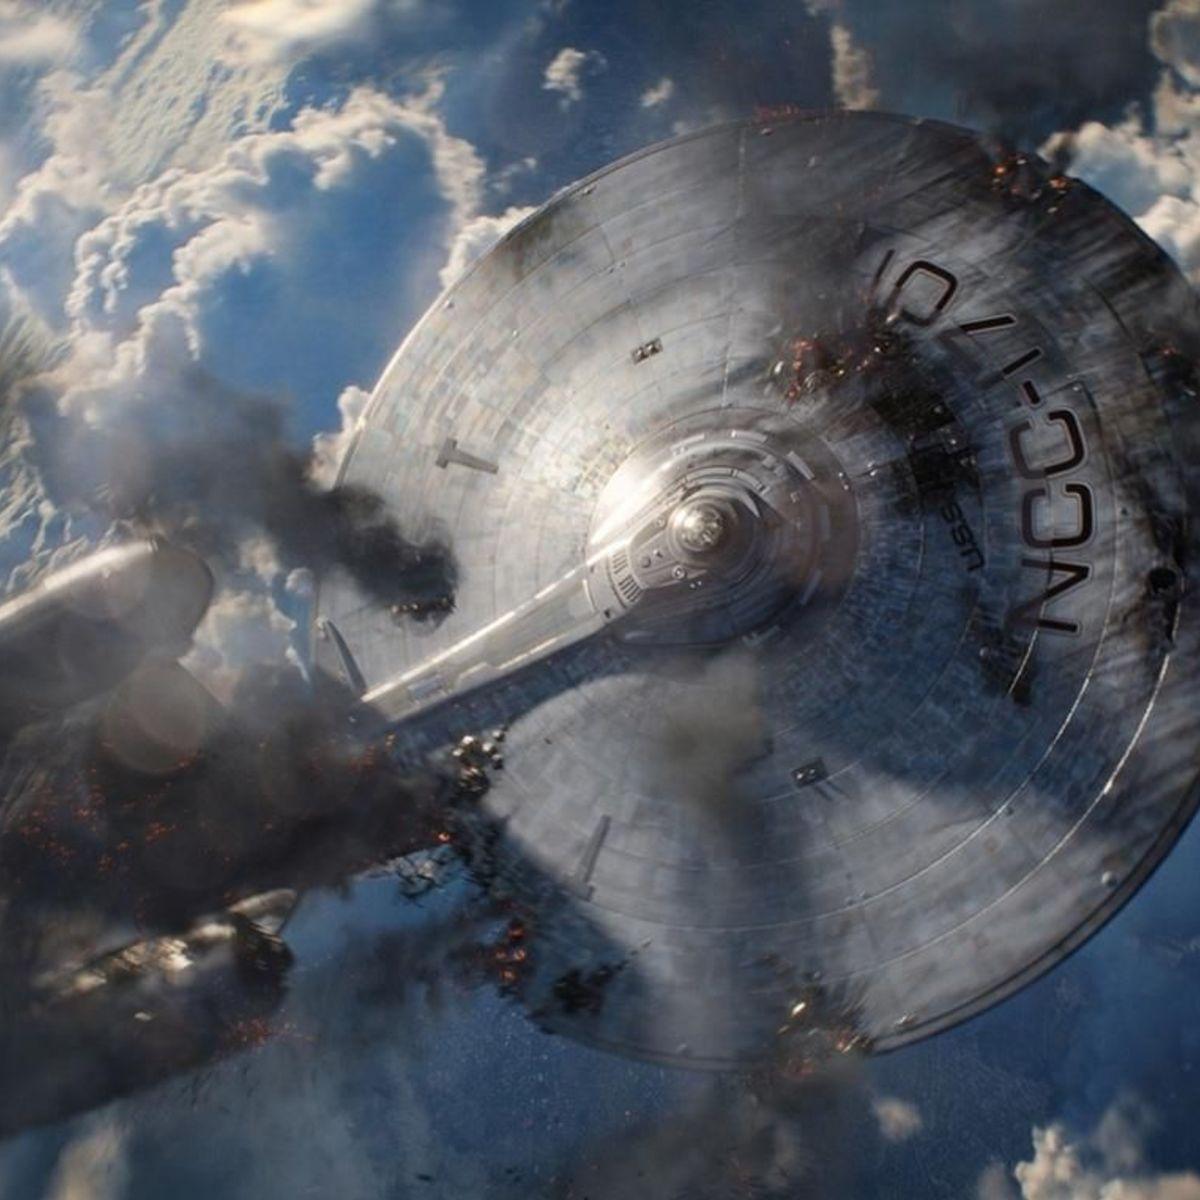 Enterprise-Crashing-Star-Trek-Into-Darkness.jpg